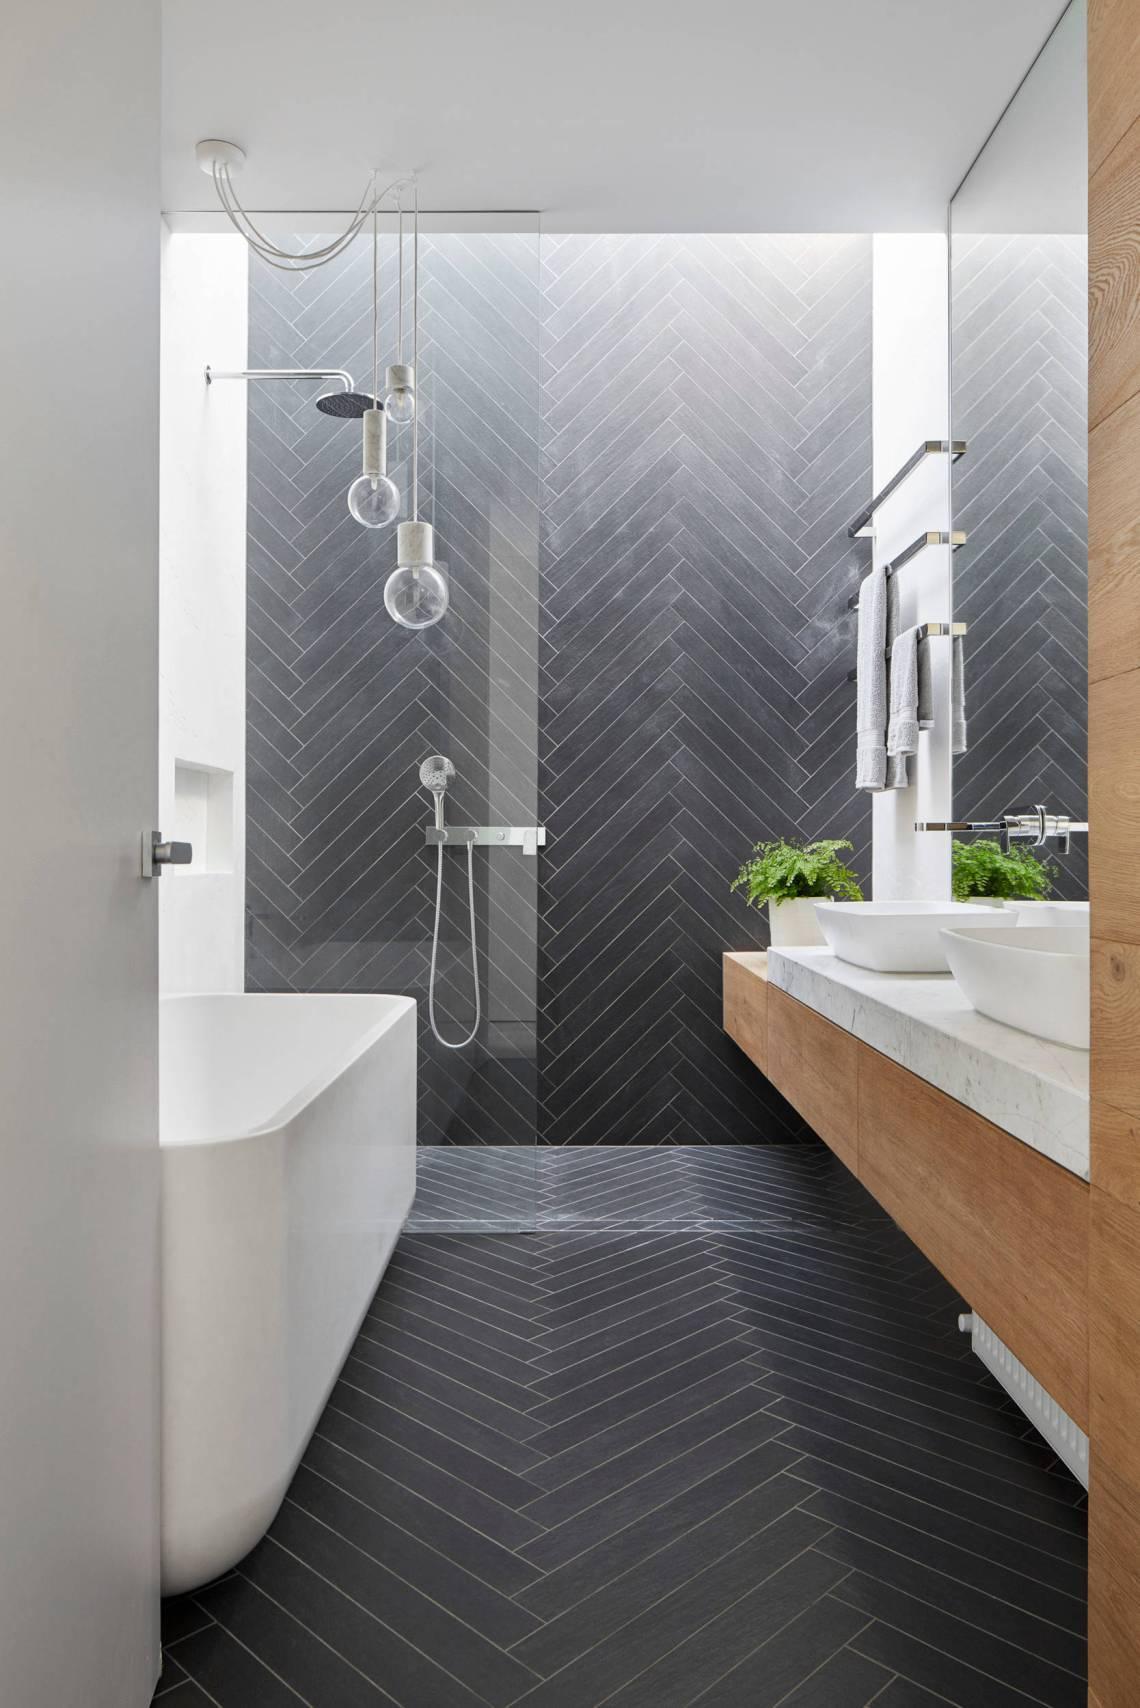 100 Beautiful Bathrooms to Help You Achieve Spa Status